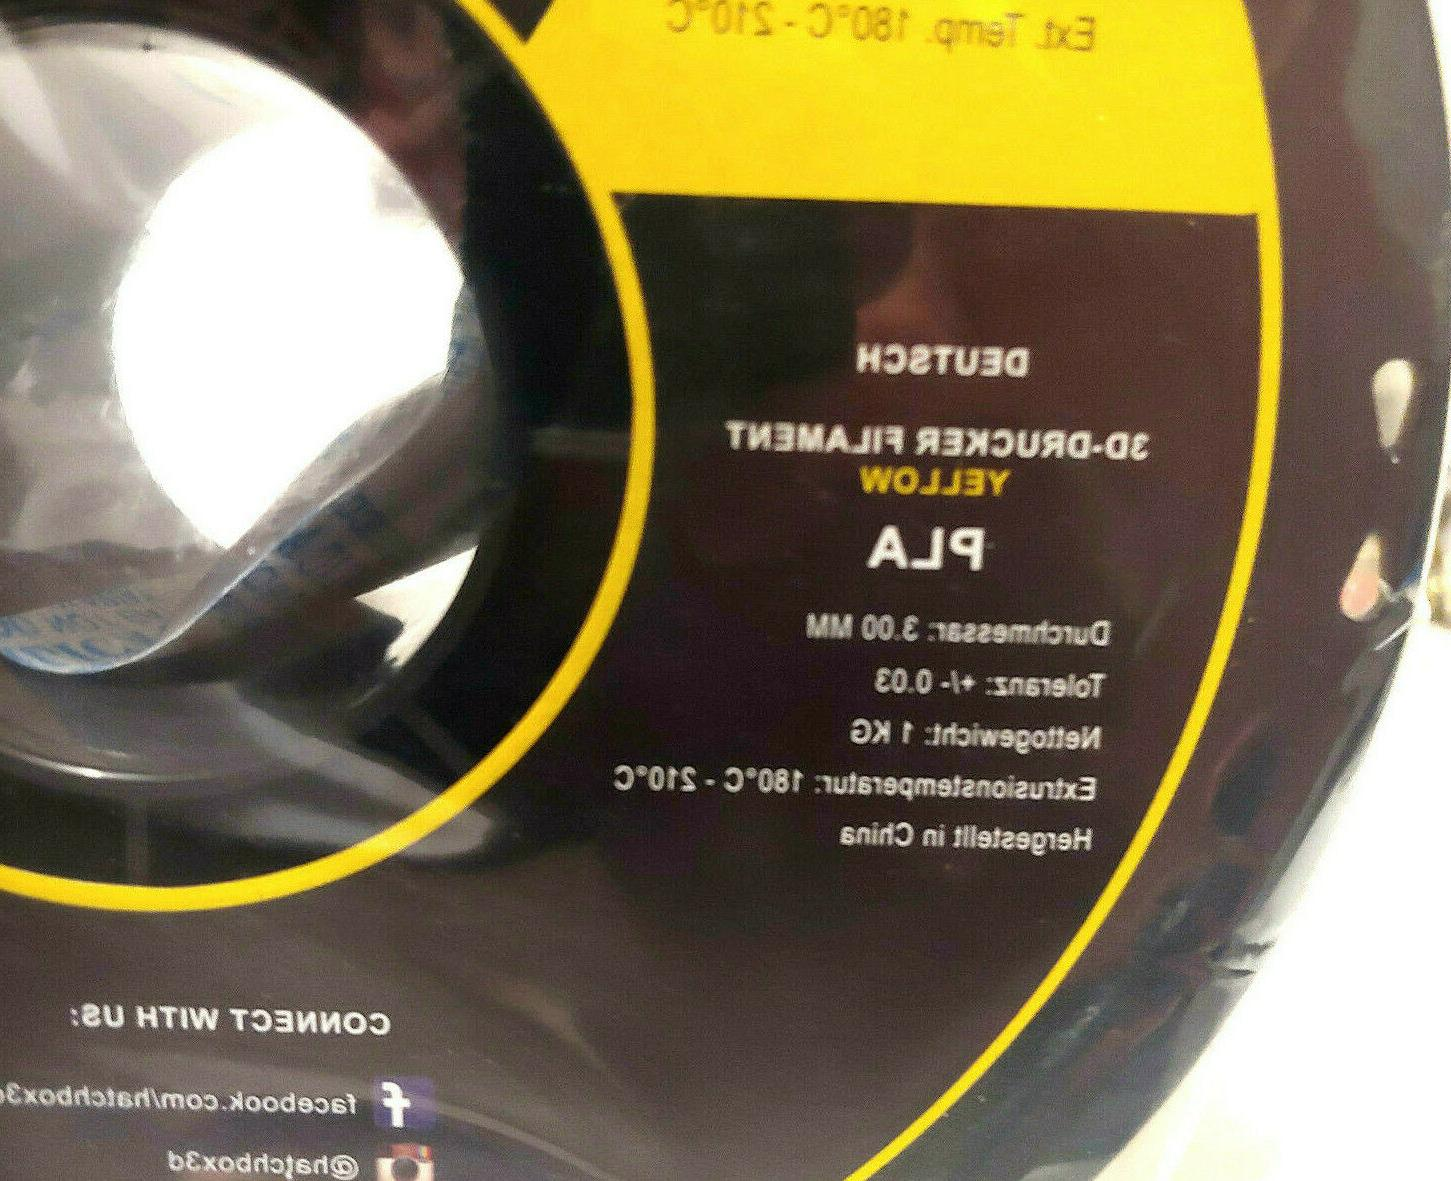 HATCHBOX 3D Filament,Dimensional Accuracy+/-